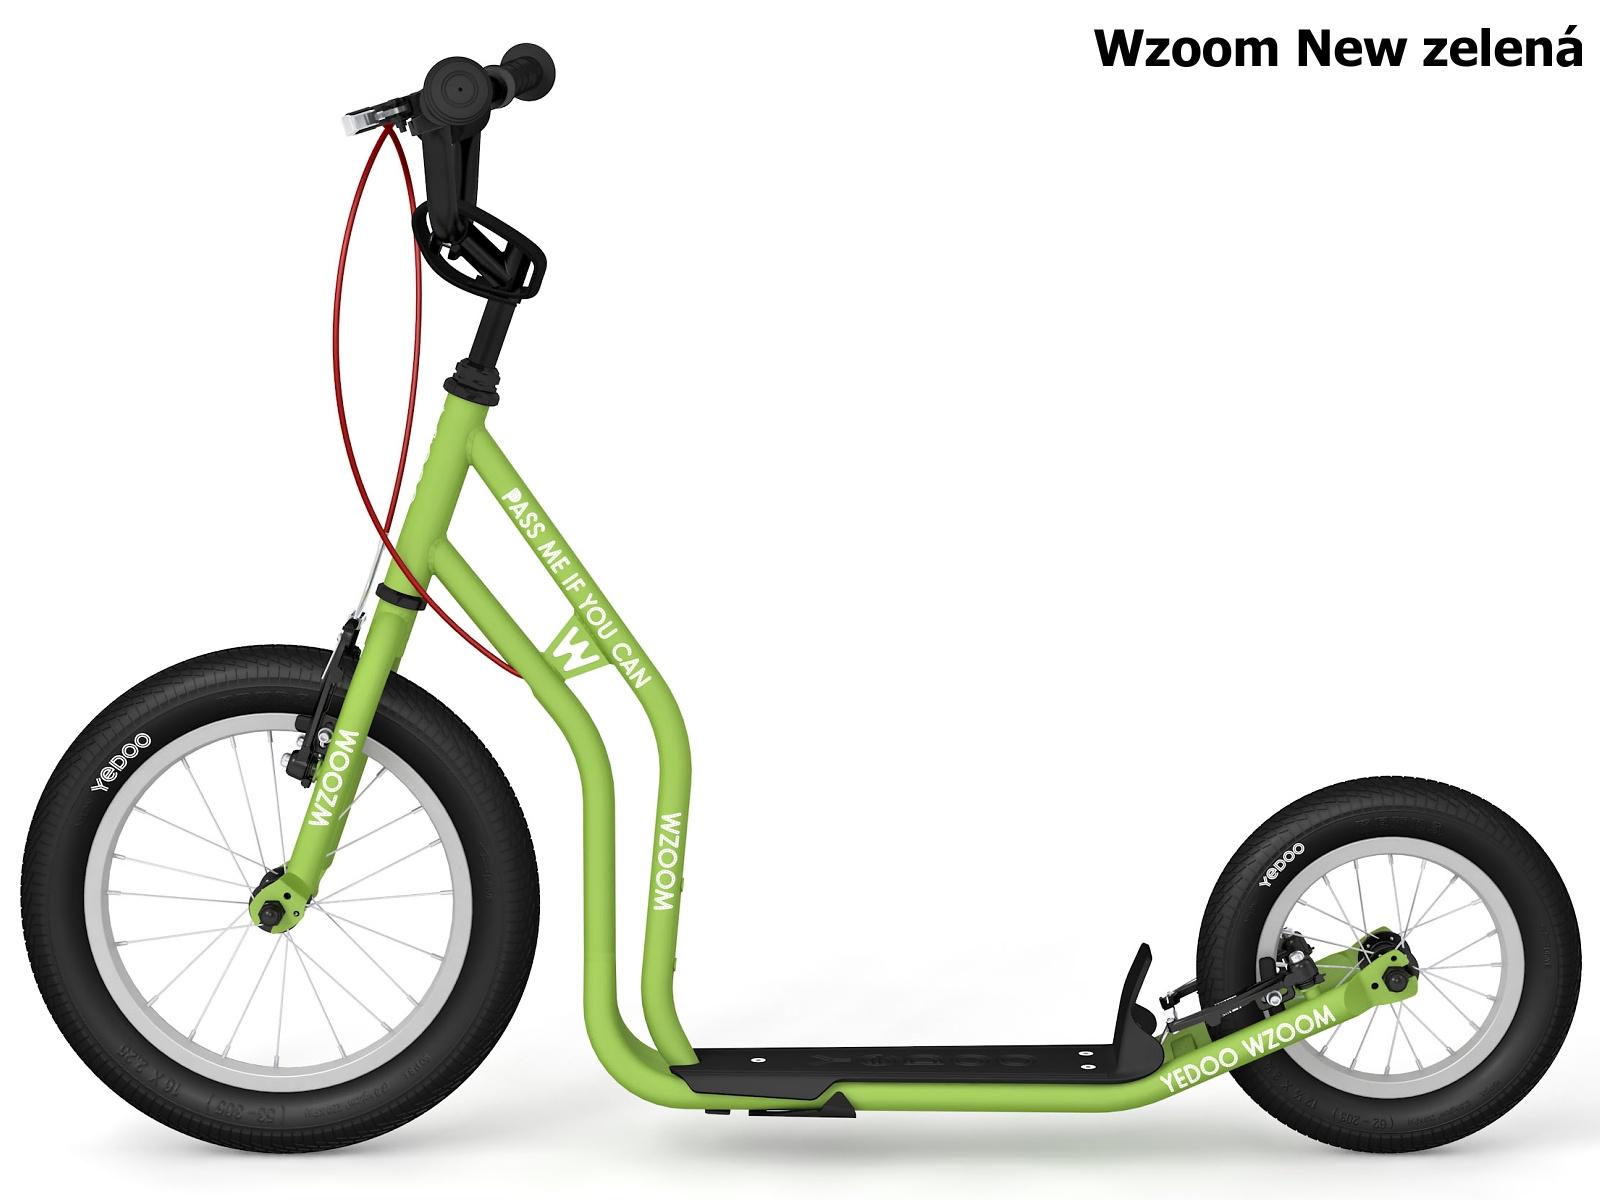 Koloběžka YEDOO Wzoom New 16-12 zelená